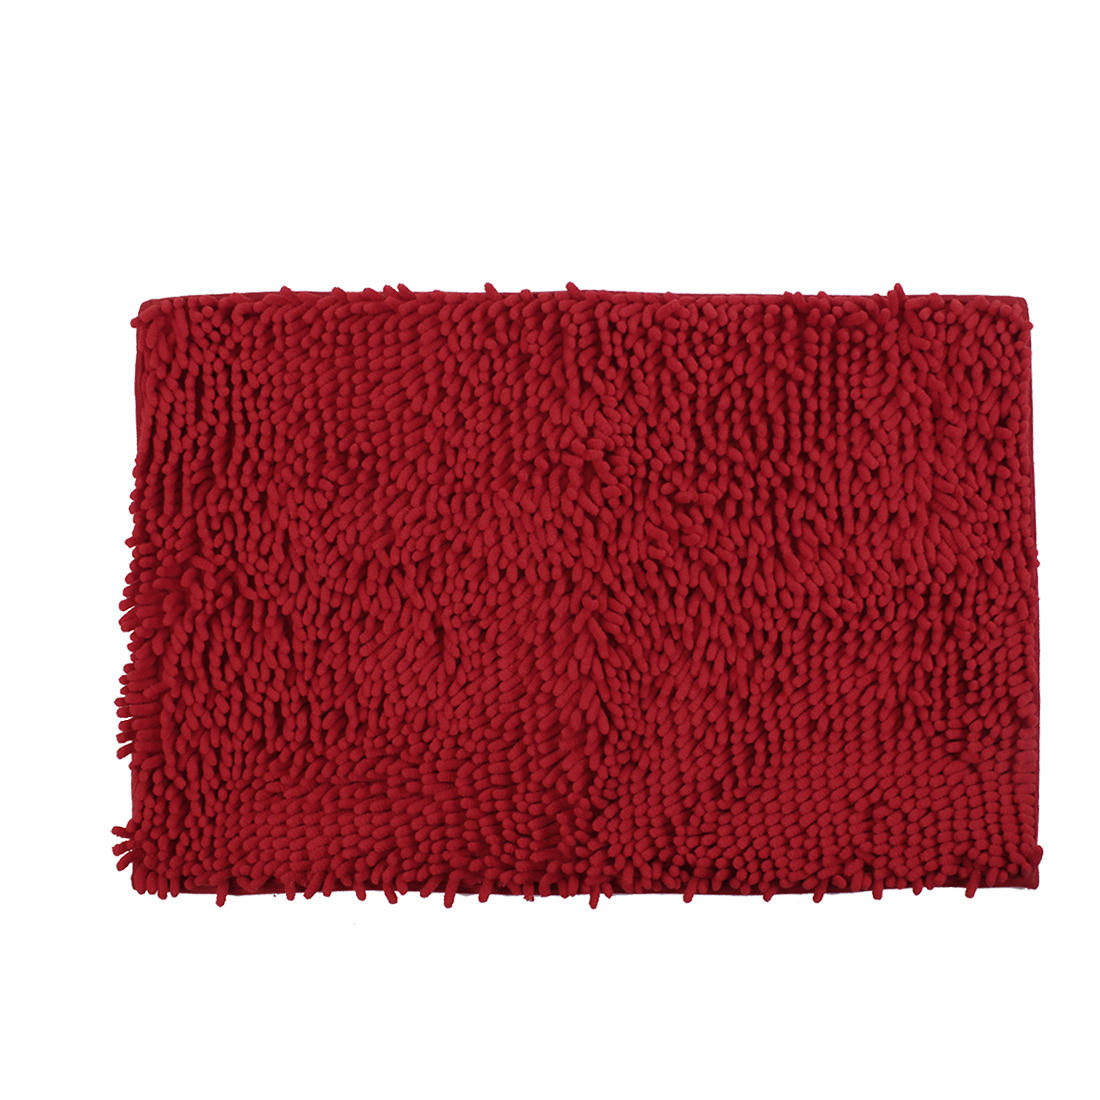 60cm x 40cm Rectangle Dinning Room Bedroom Floor Area Rug Carpet Mat Red